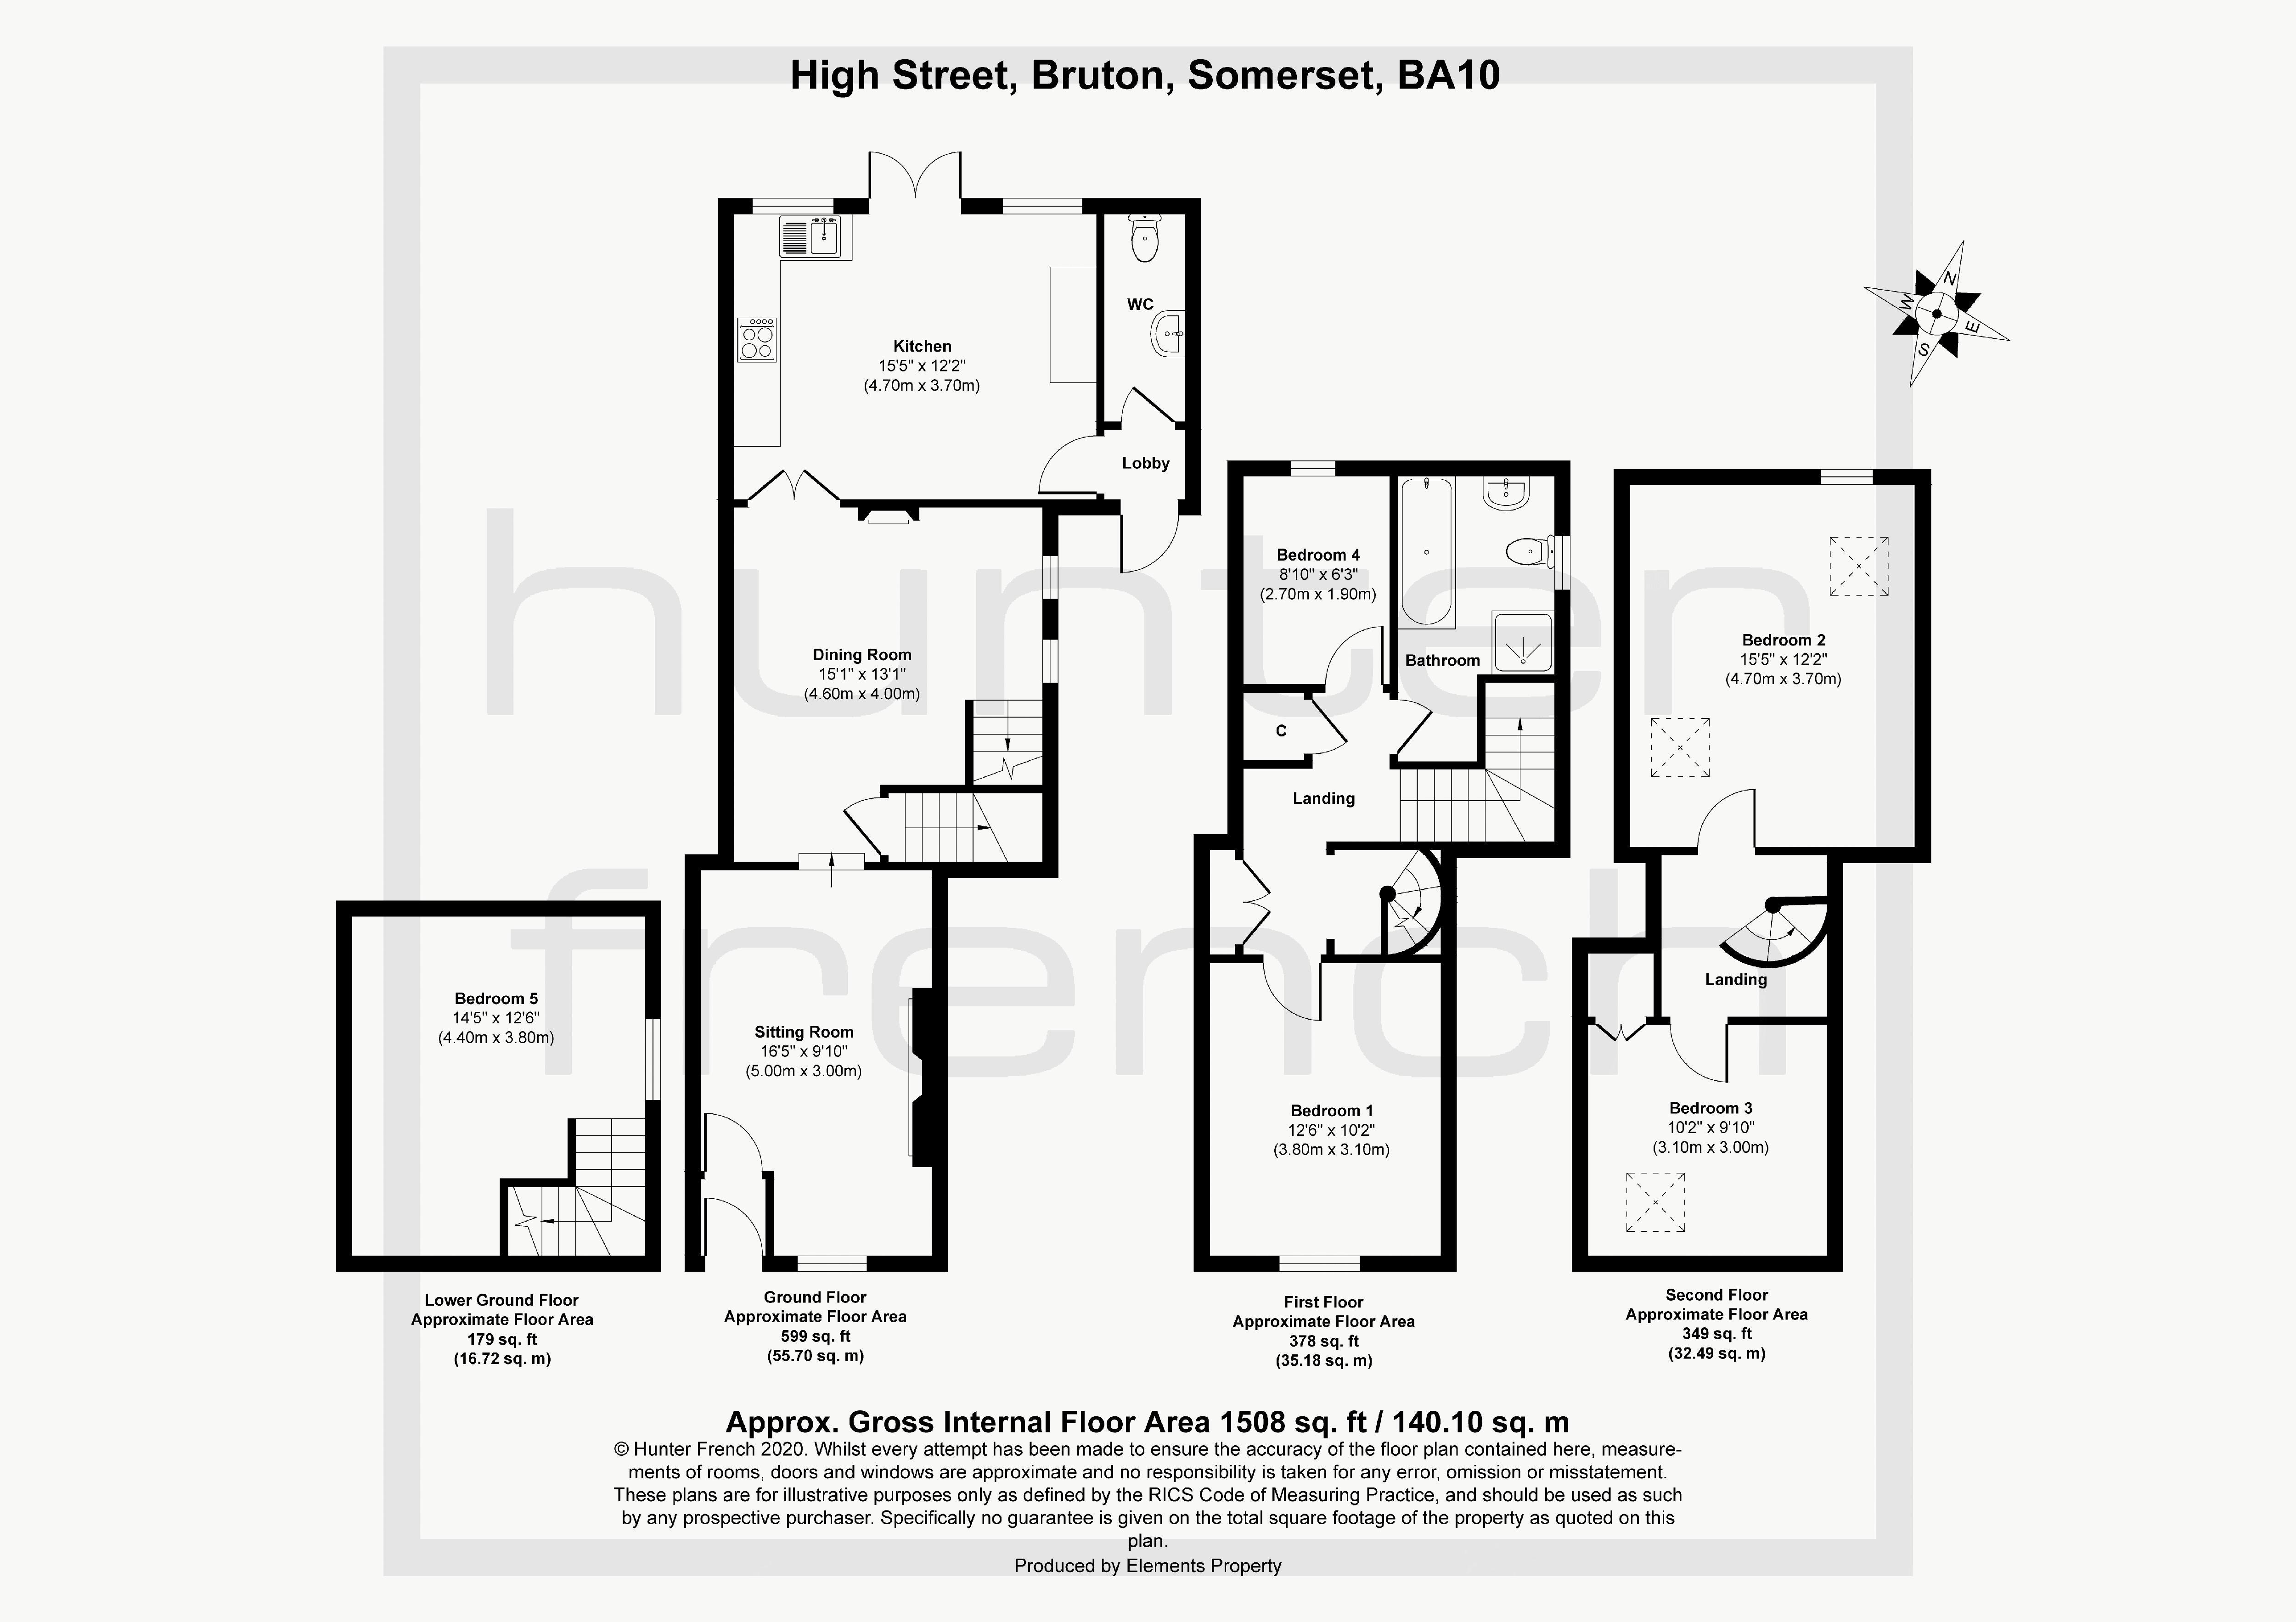 37 The High Street Floorplan